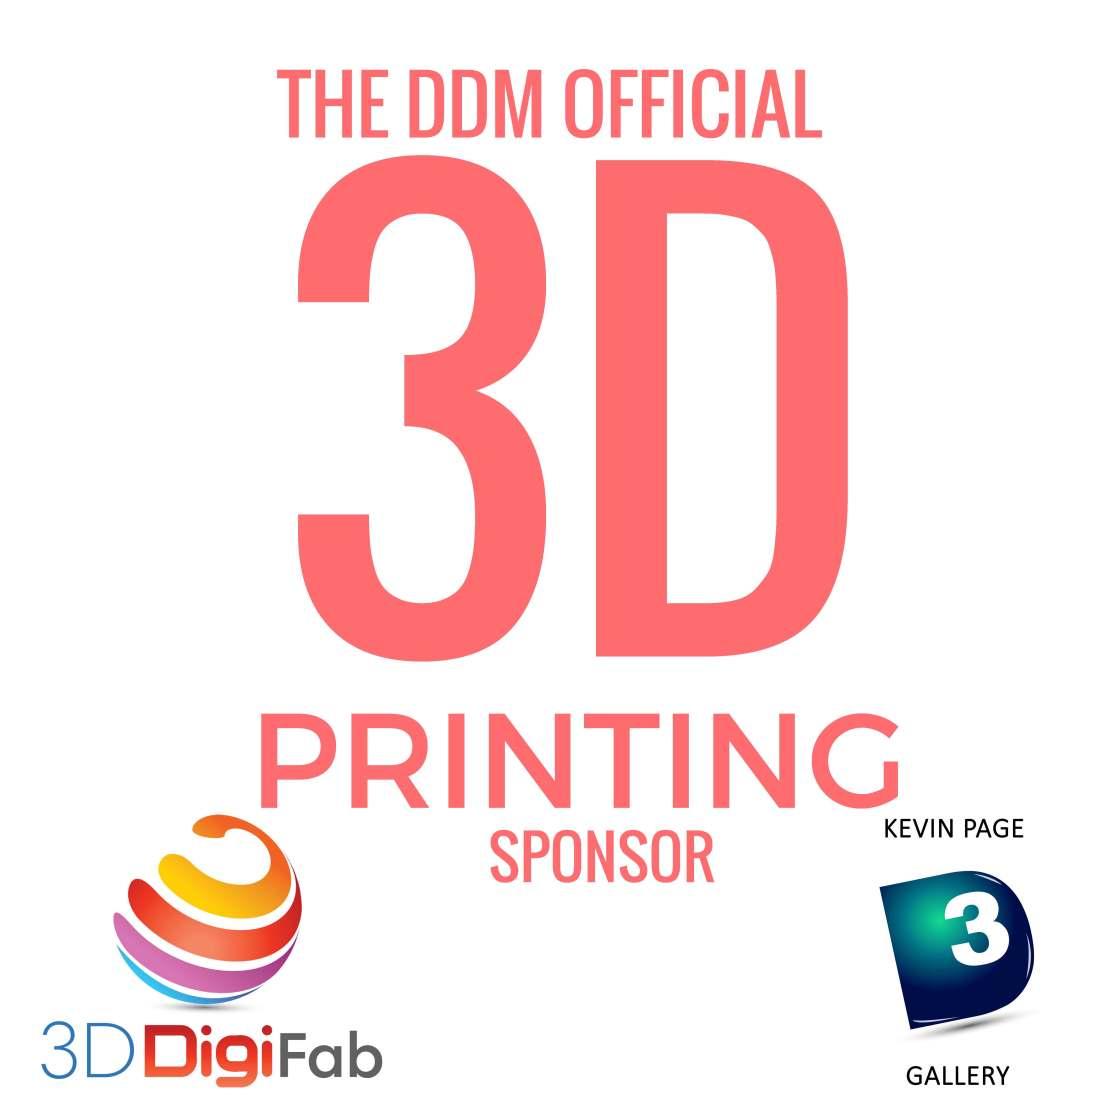 3Dprintingsponsor